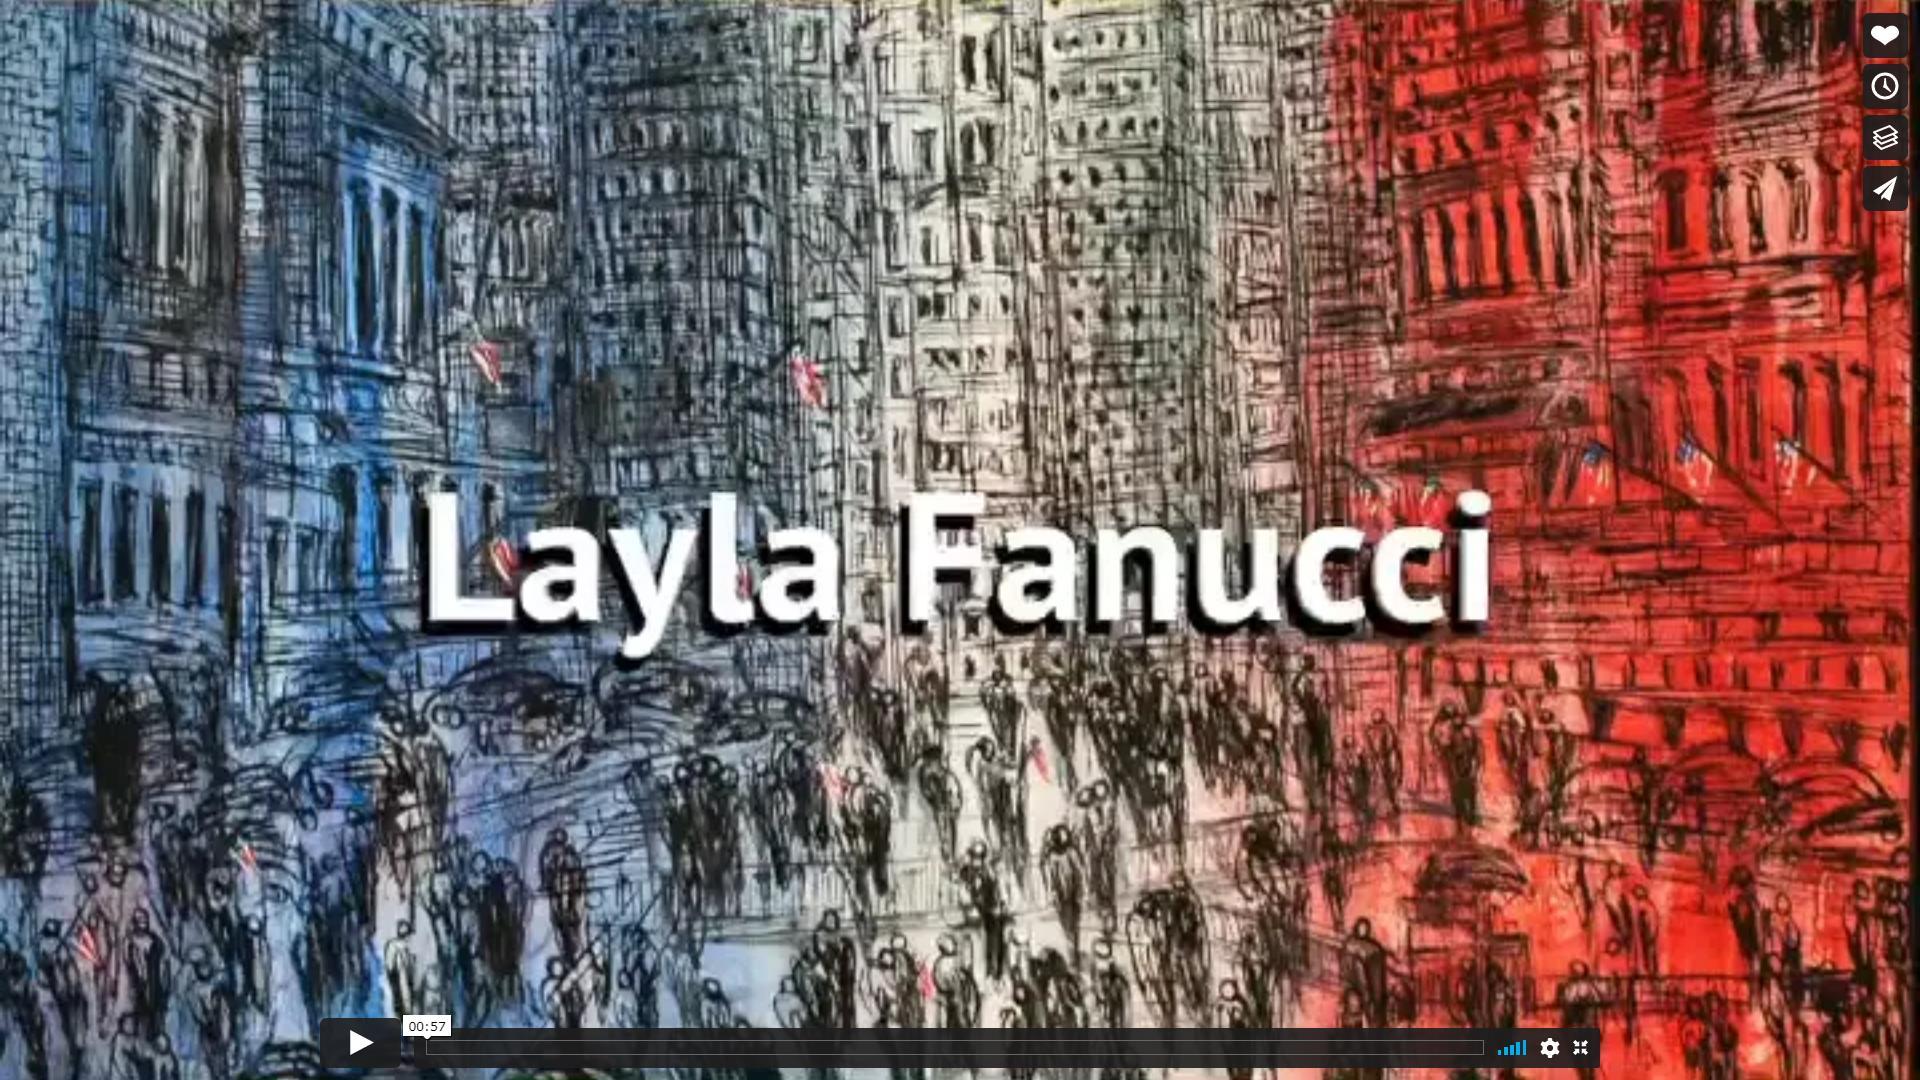 laylafanucci.com